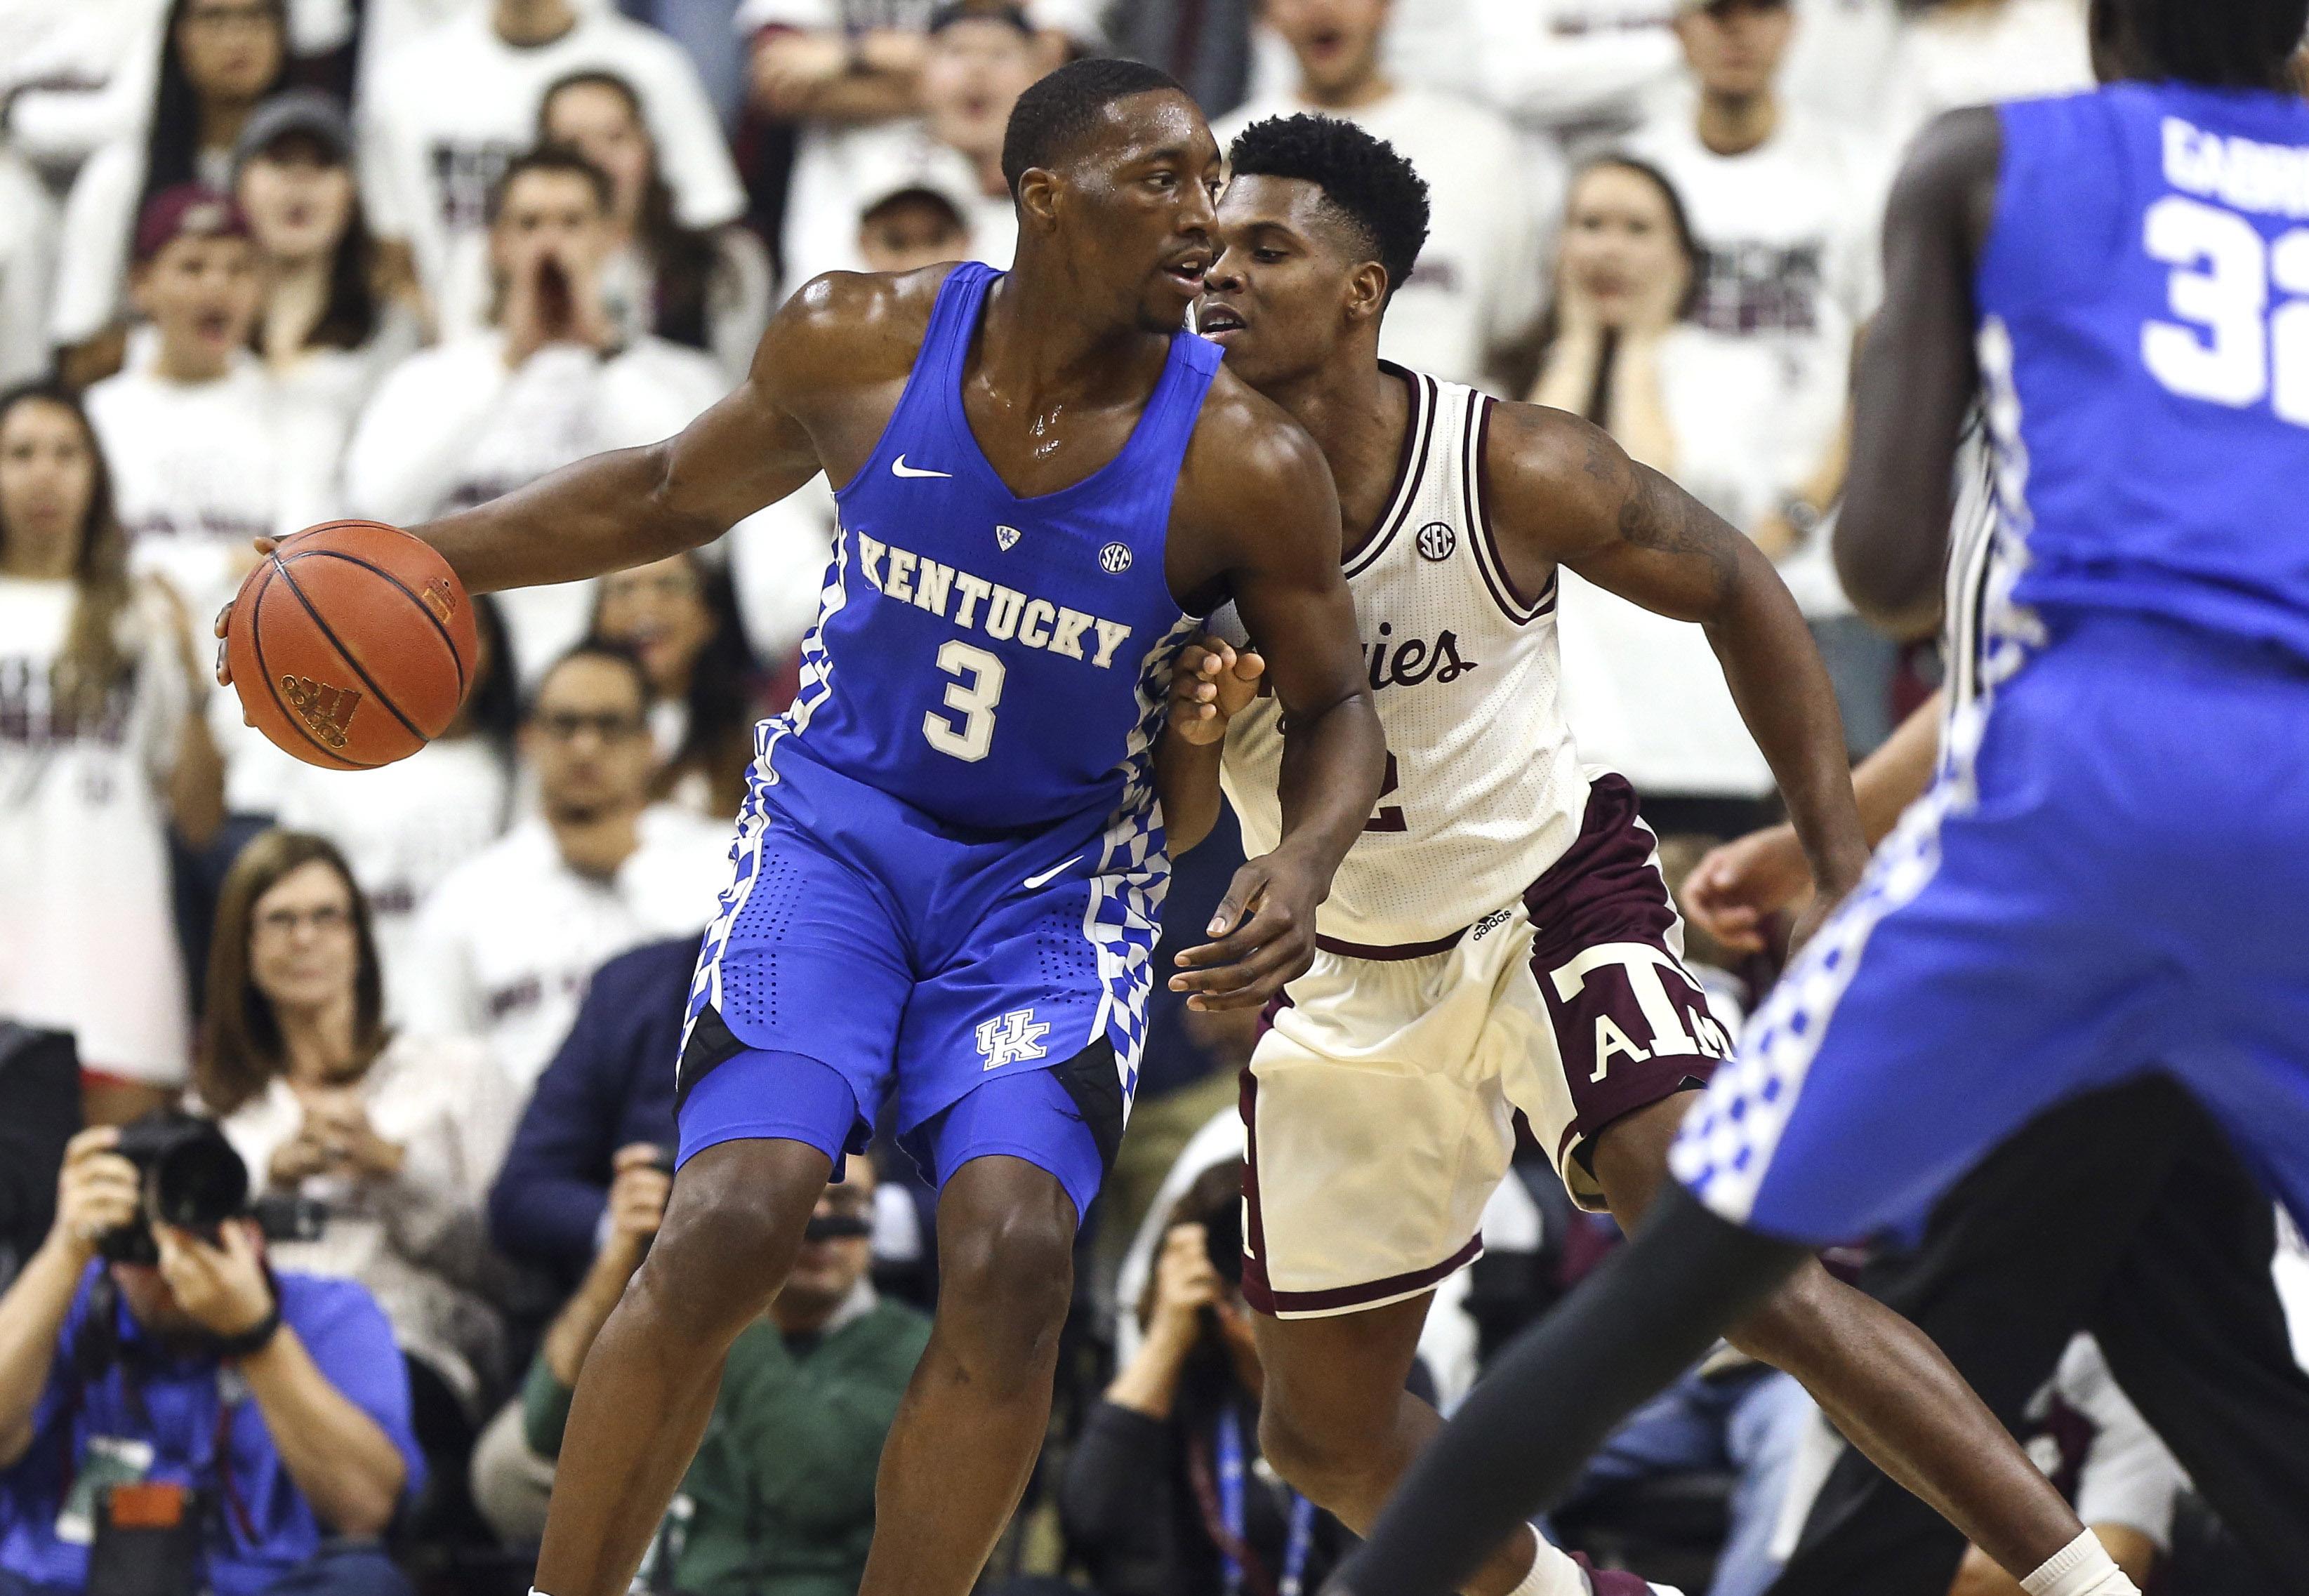 Kentucky Basketball Fox Named Sec Freshman Of The Week: Kentucky Basketball's Bam Adebayo Named SEC Freshman Of